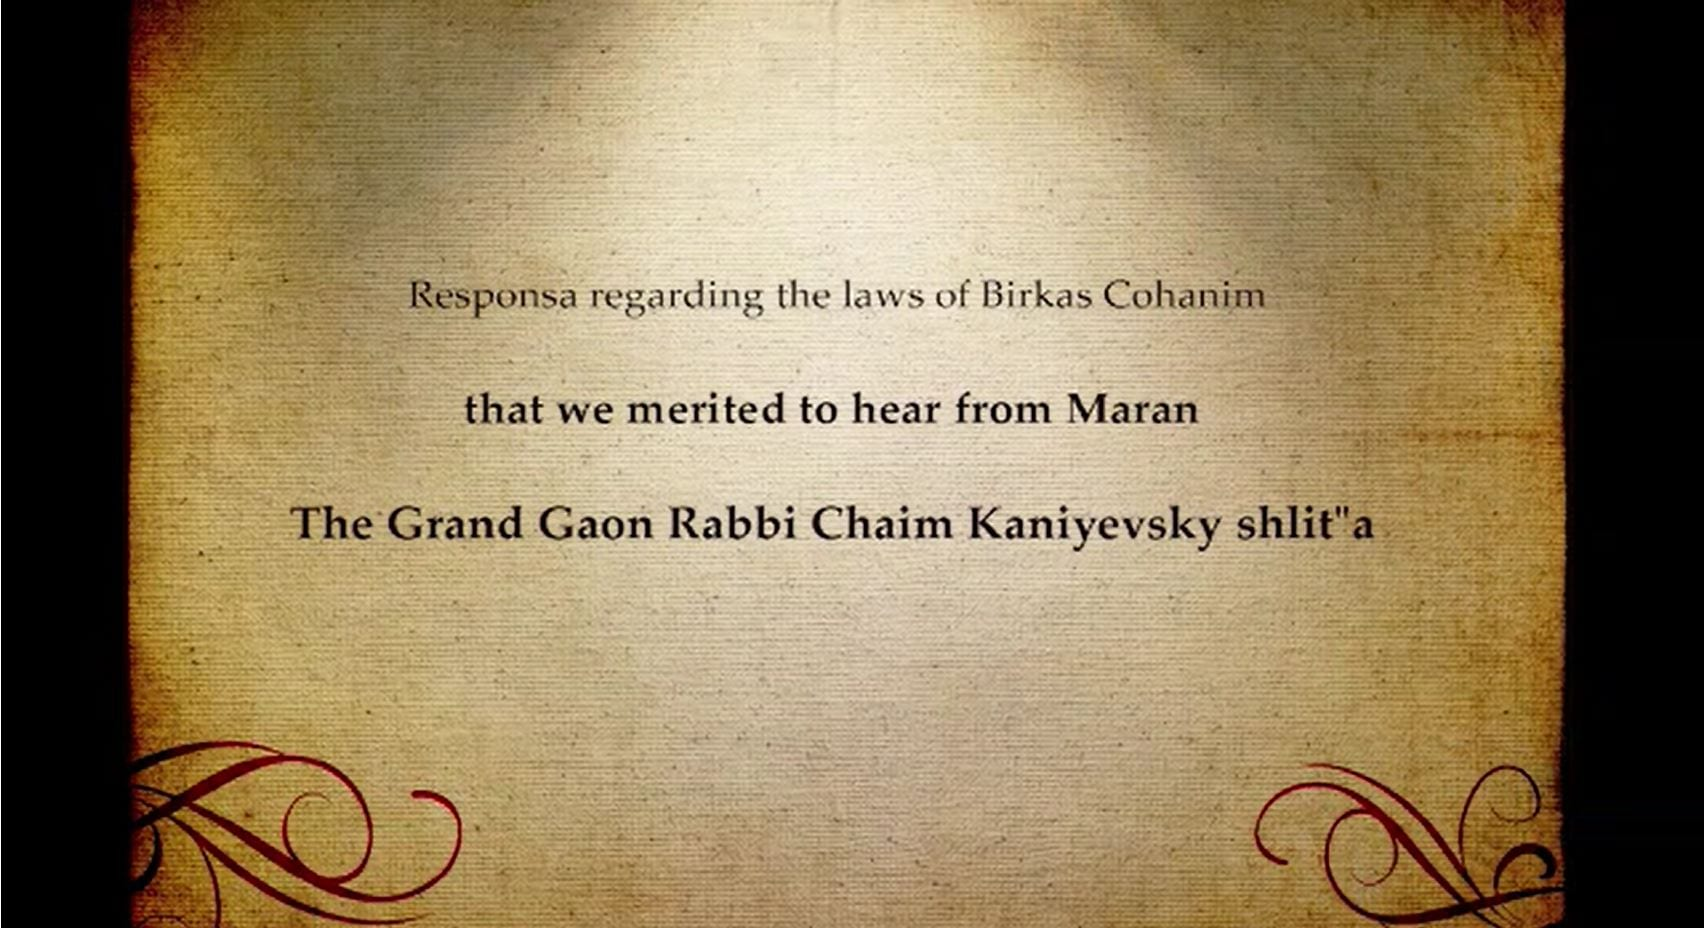 Q&A on Birkas Cohanim